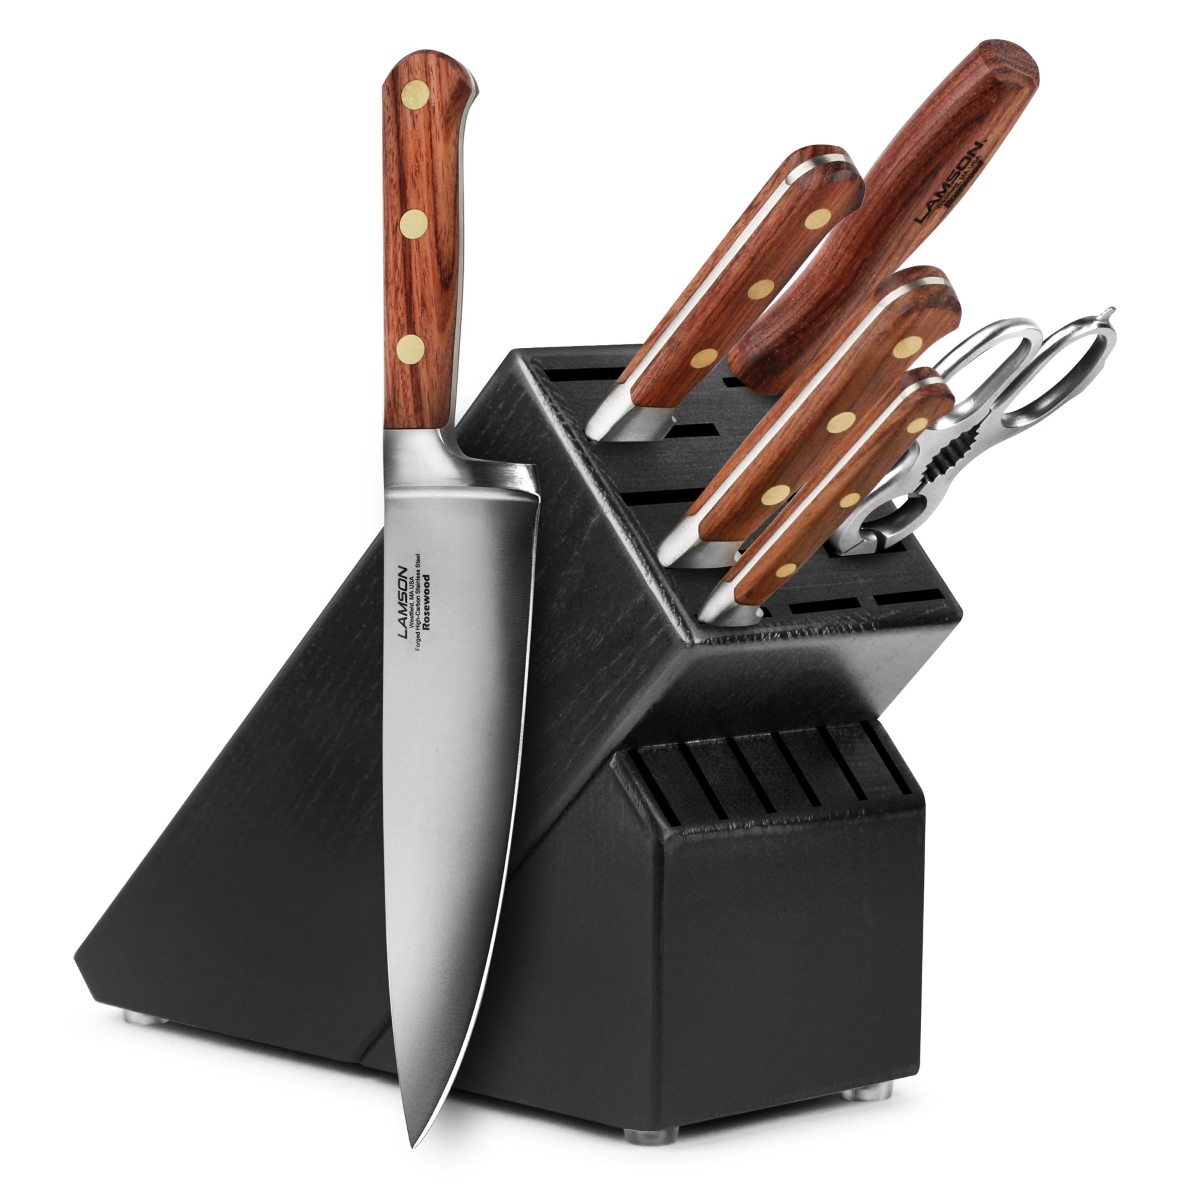 Lamson Rosewood 7 Piece Black Knife Block Set